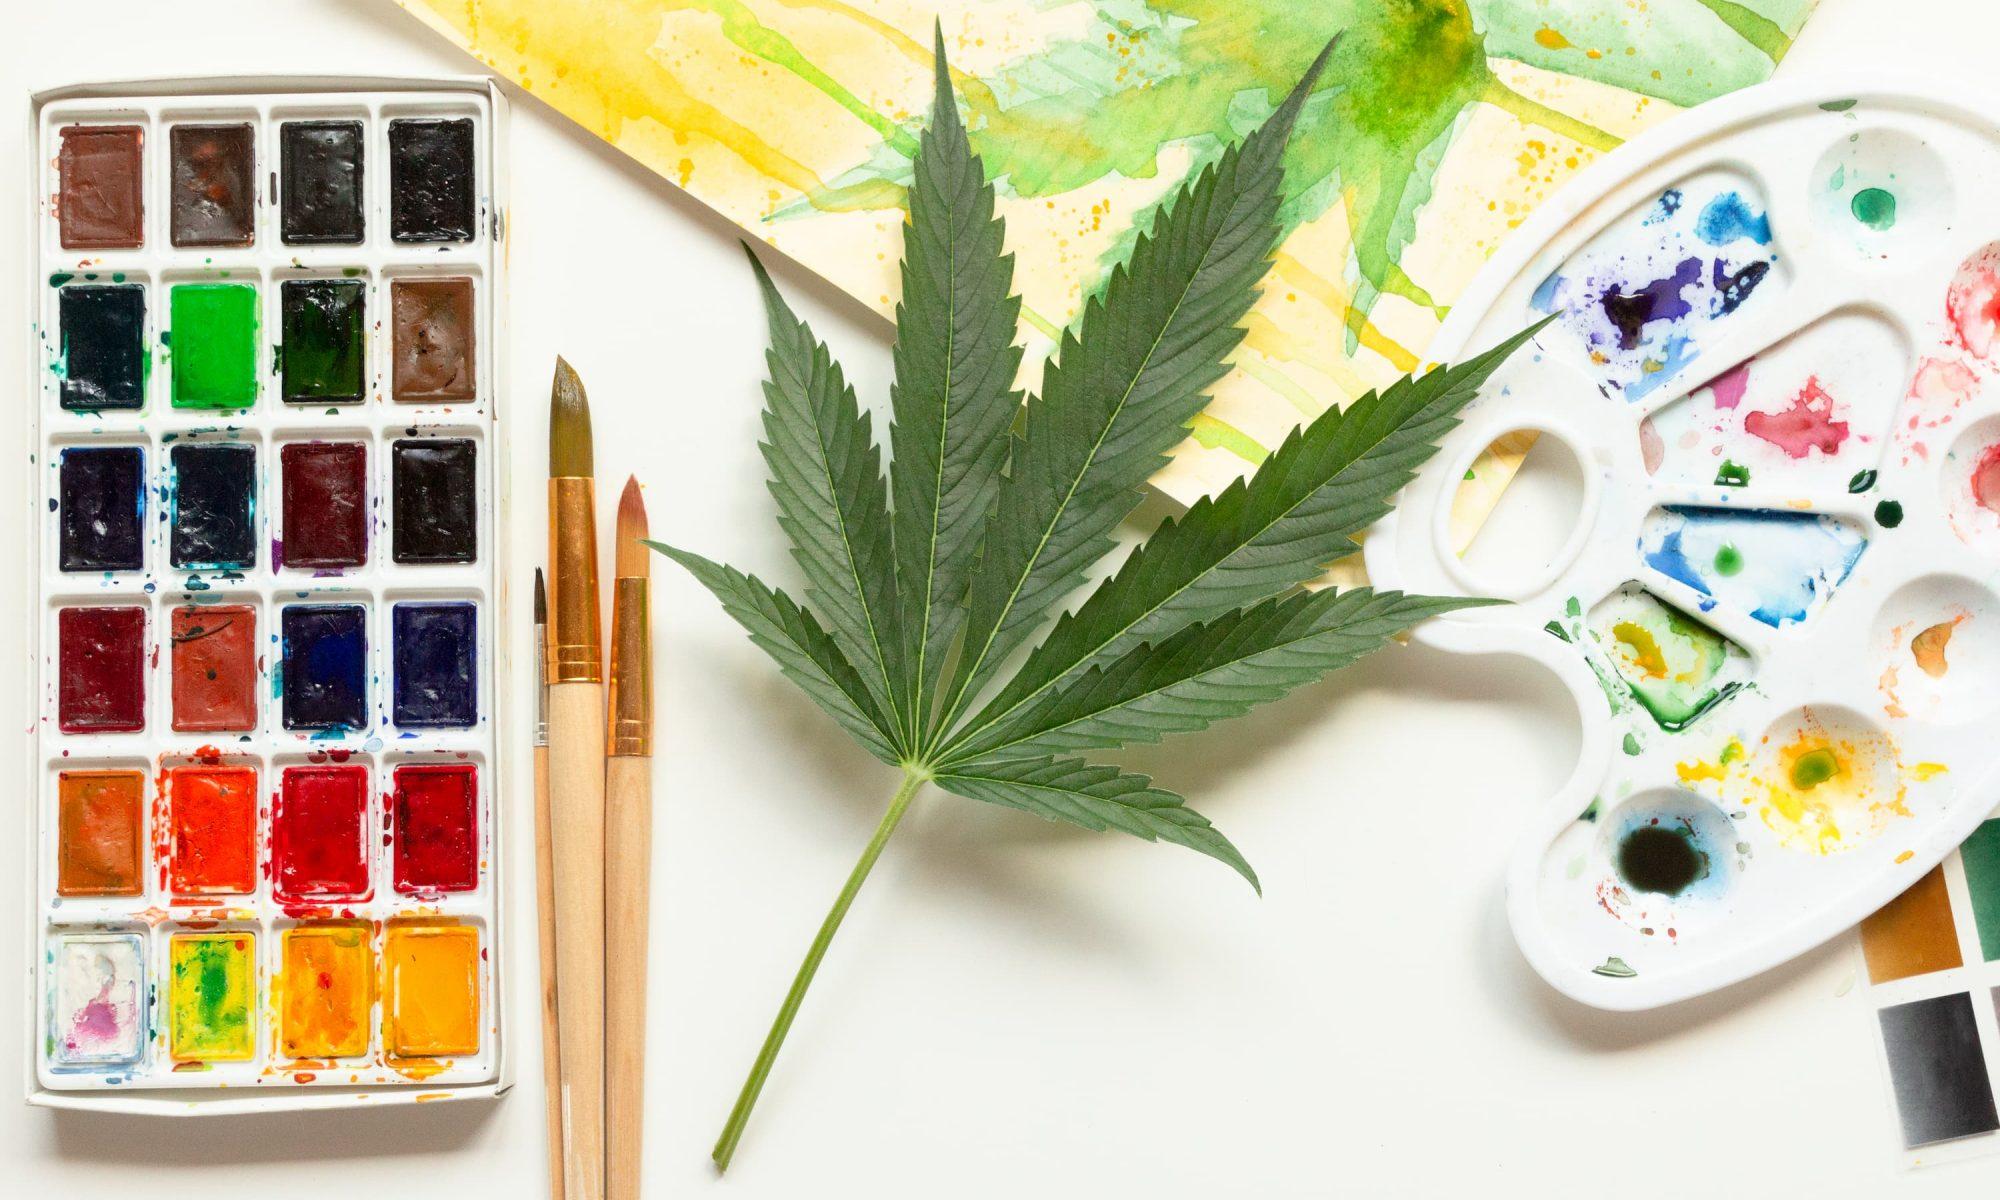 Painting art supplies next to a cannabis leaf